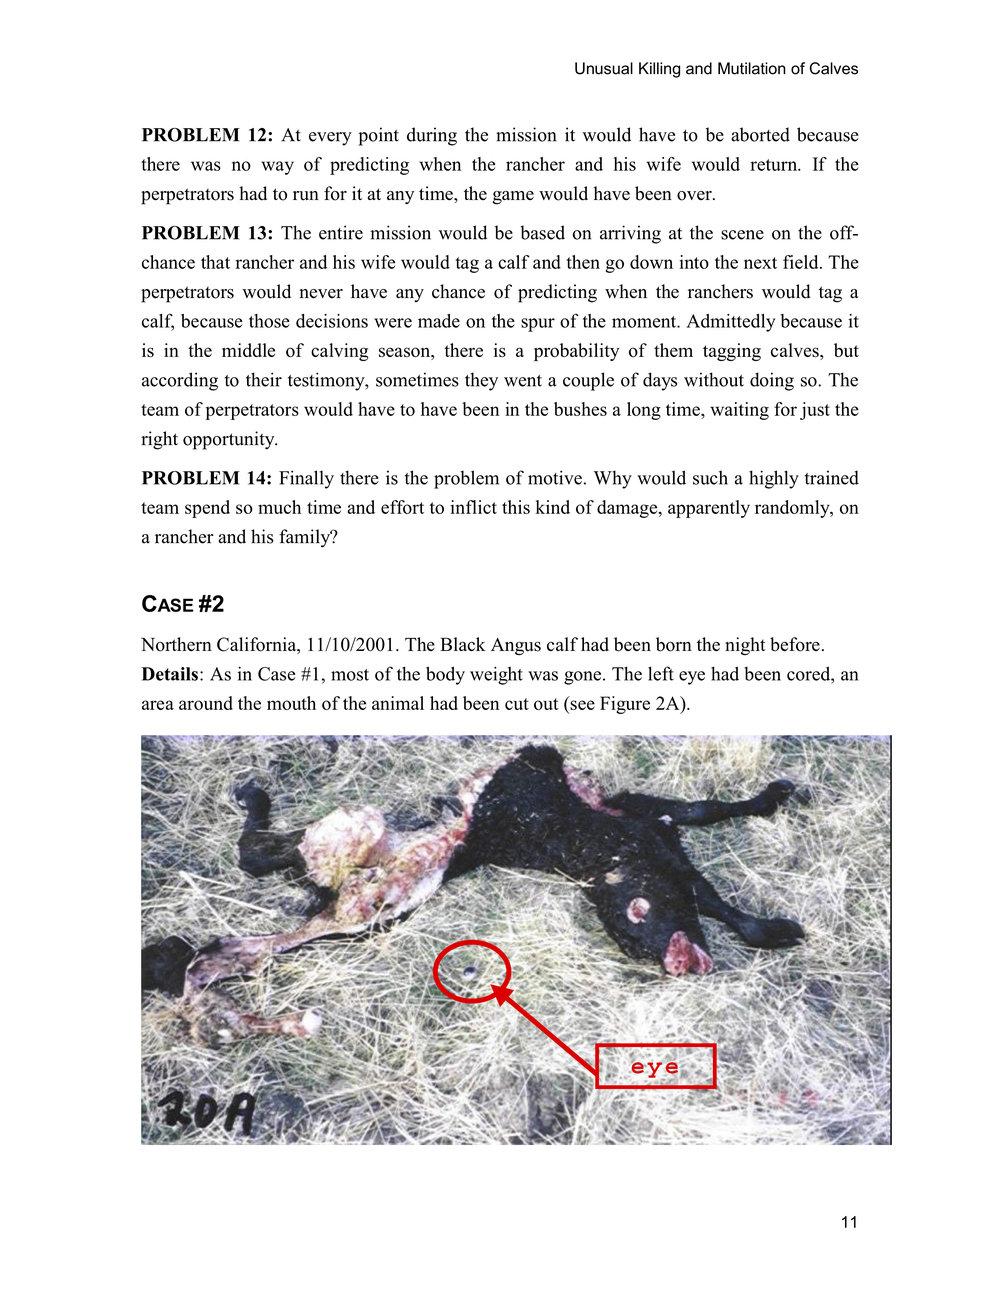 1997 ANIMAL MUTILATION REPORT 10.jpg